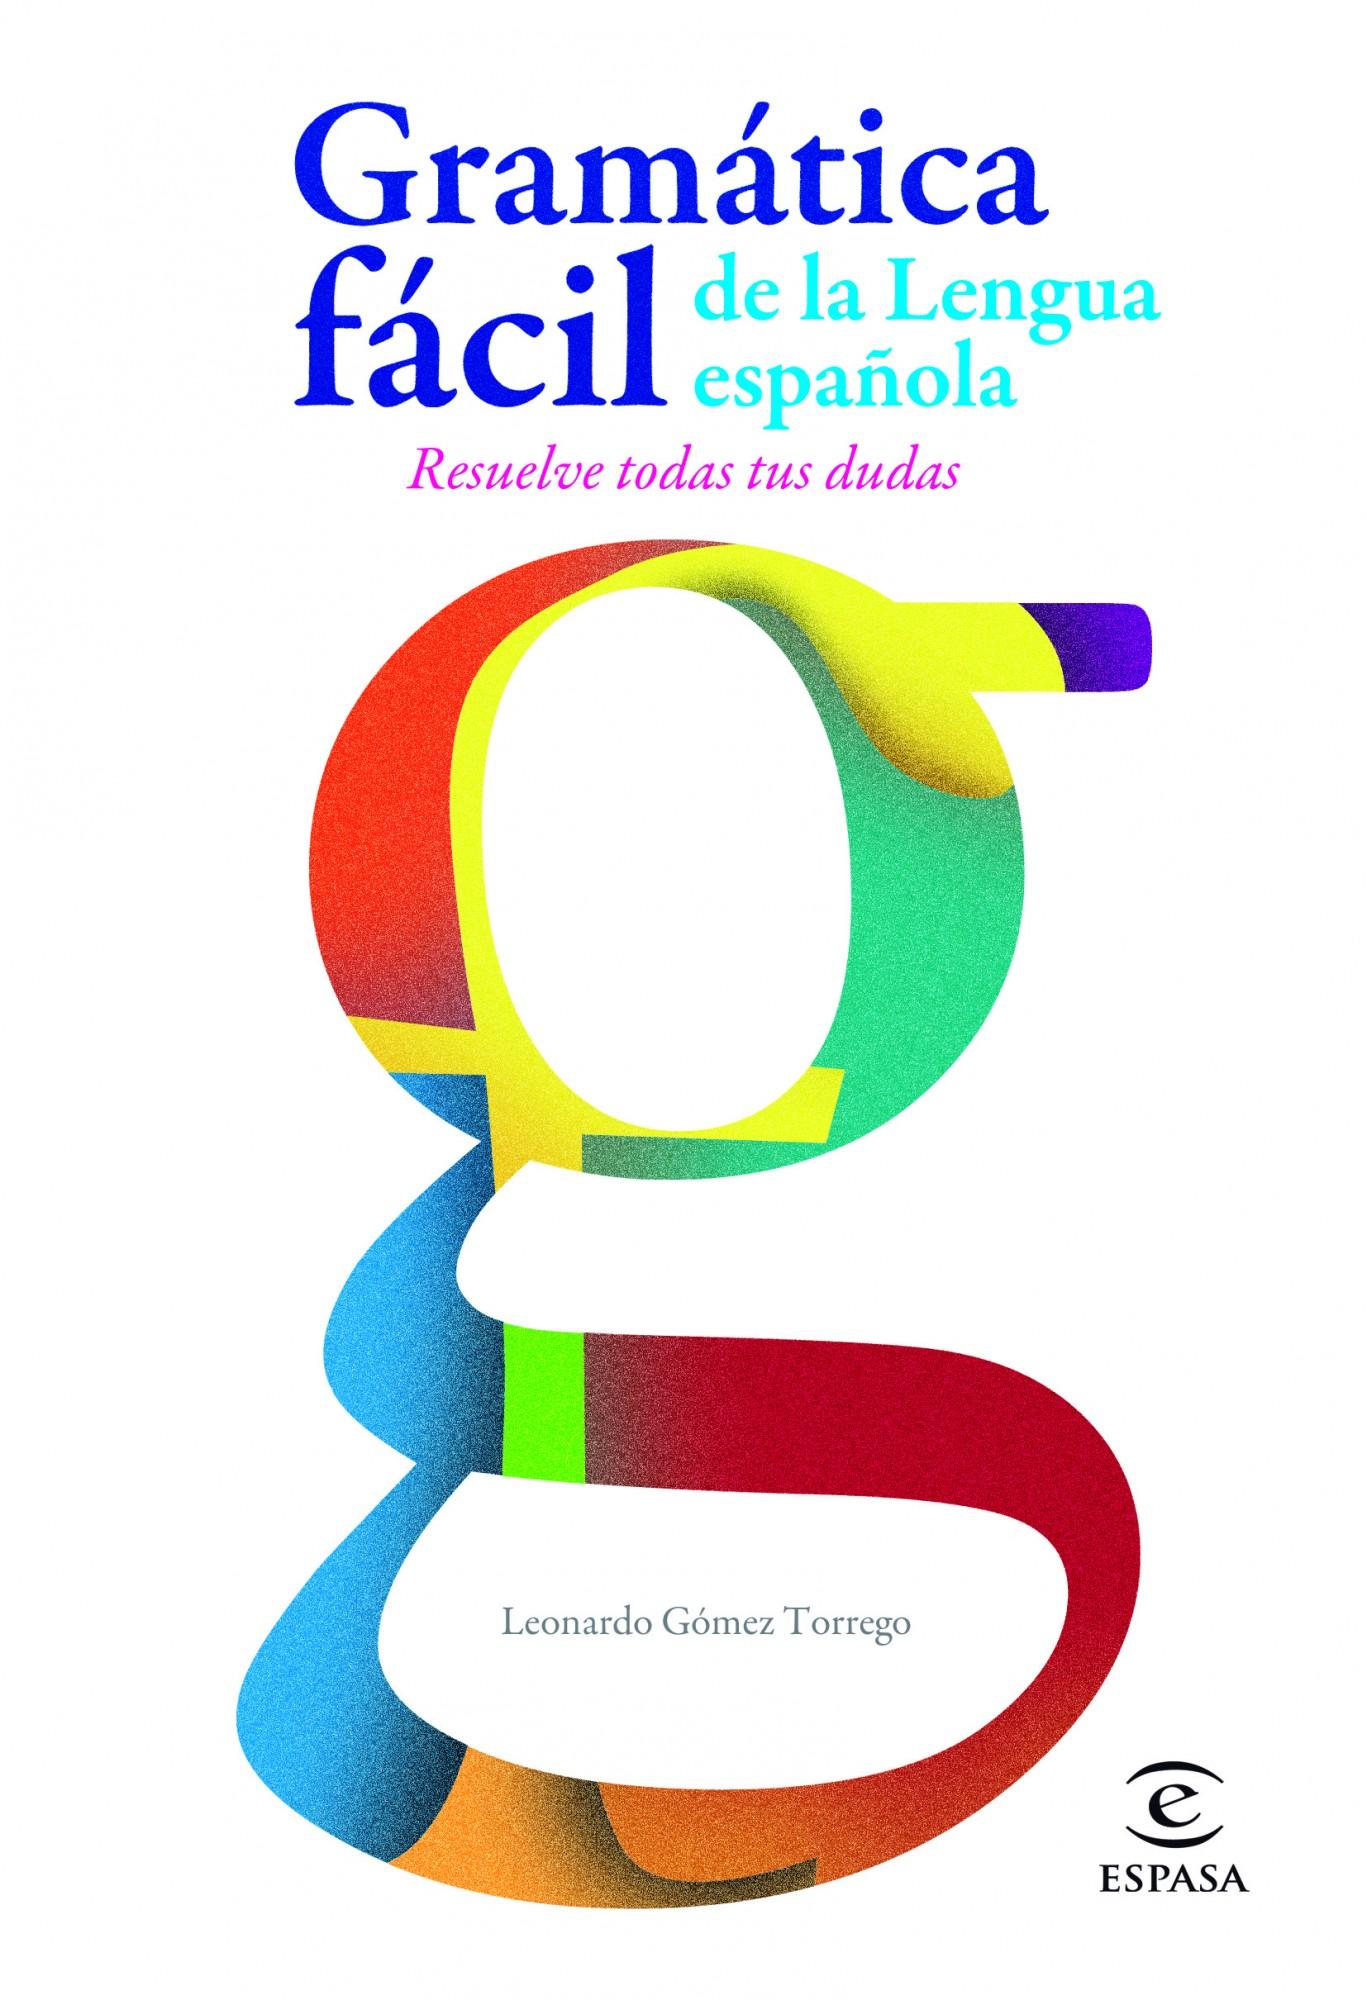 gramatica super facil de la lengua española-leonardo gomez torrego-9788467005271